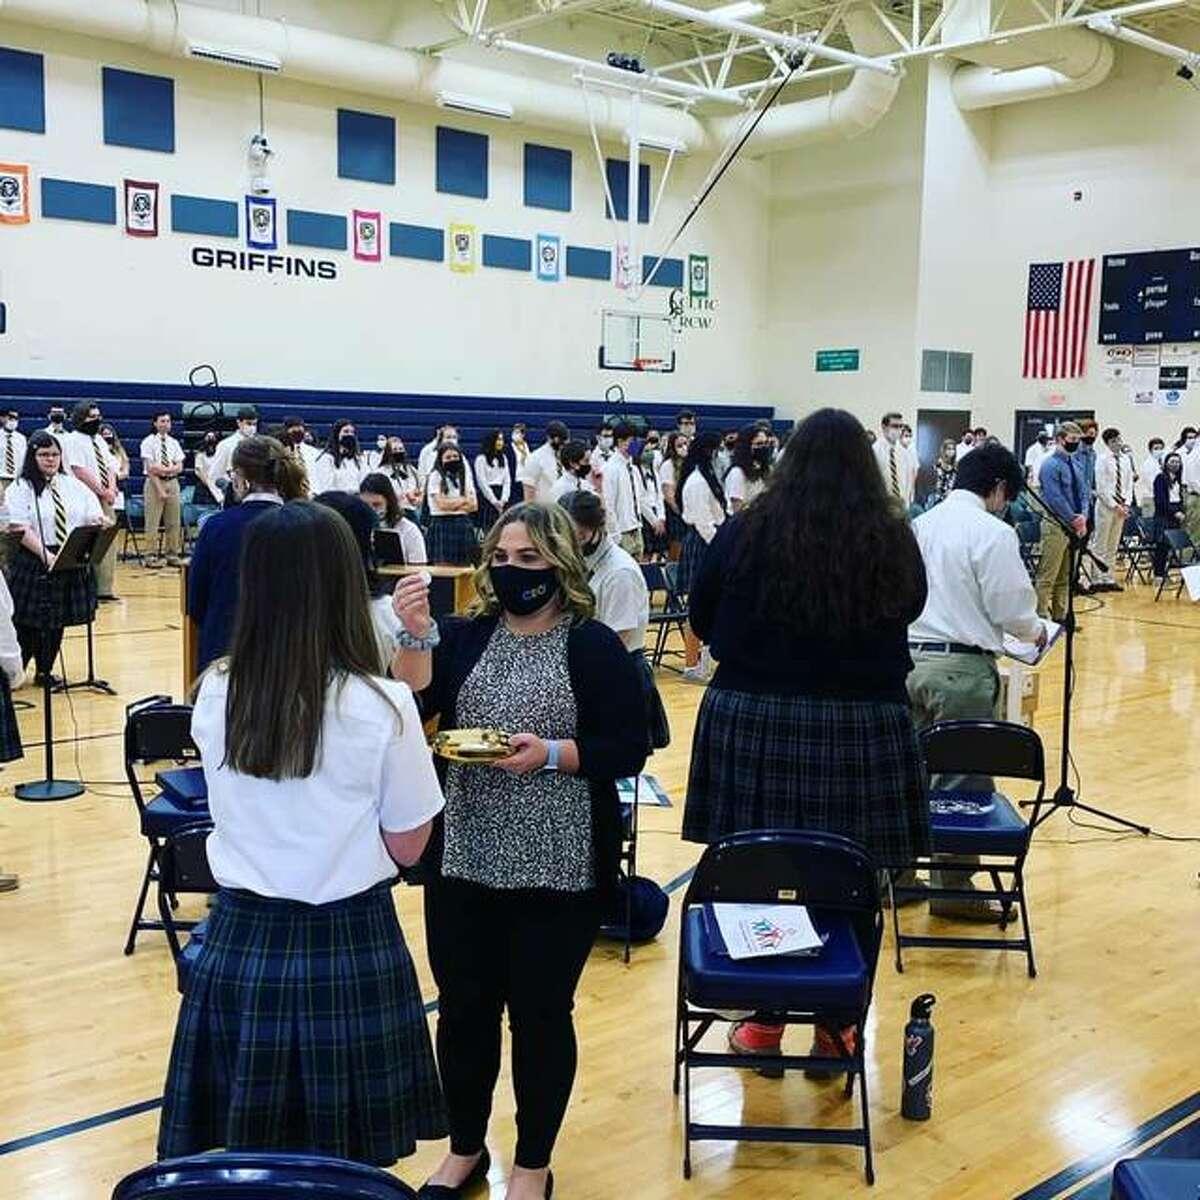 Father McGivney Catholic High School have Mass on campus Tuesday with Bishop Thomas Paprocki during Catholic Schools Week.